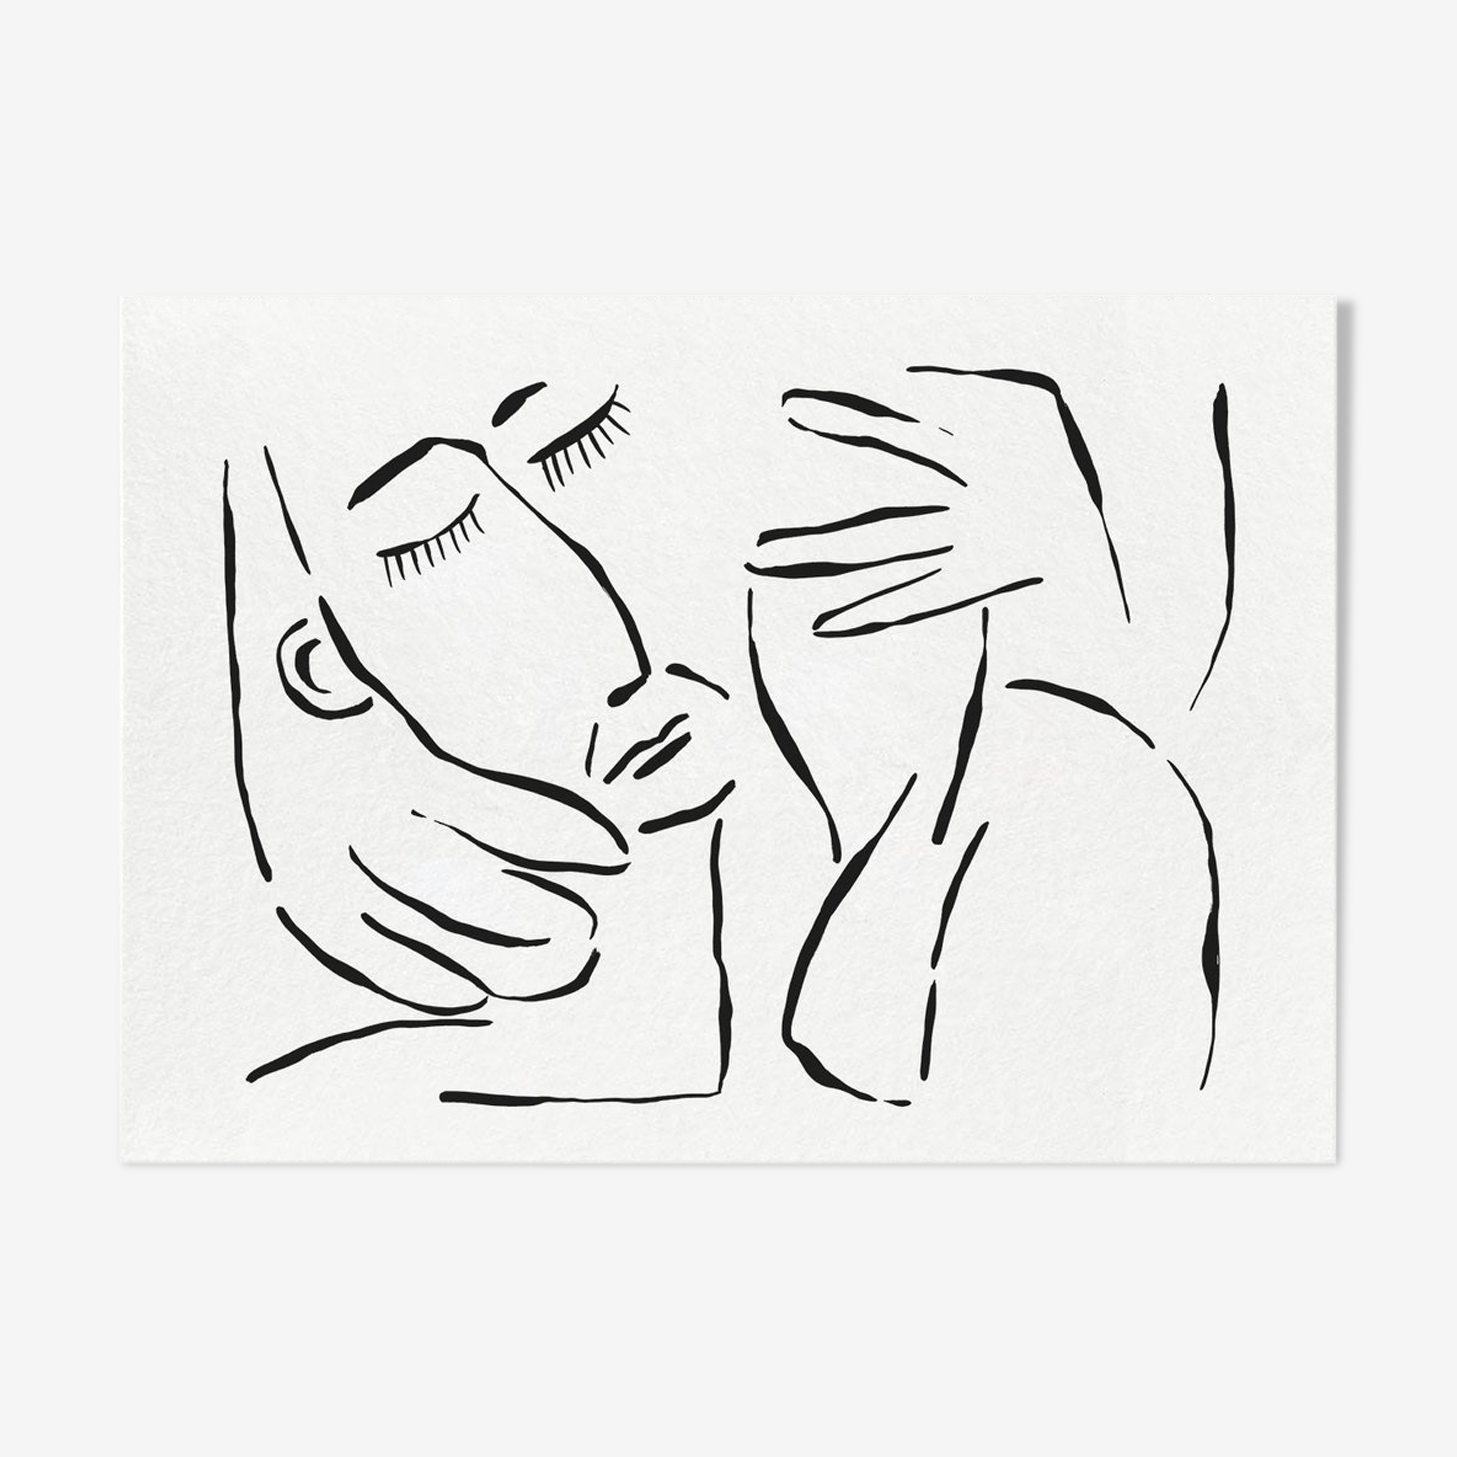 André & Nao - 60 x 42 cm